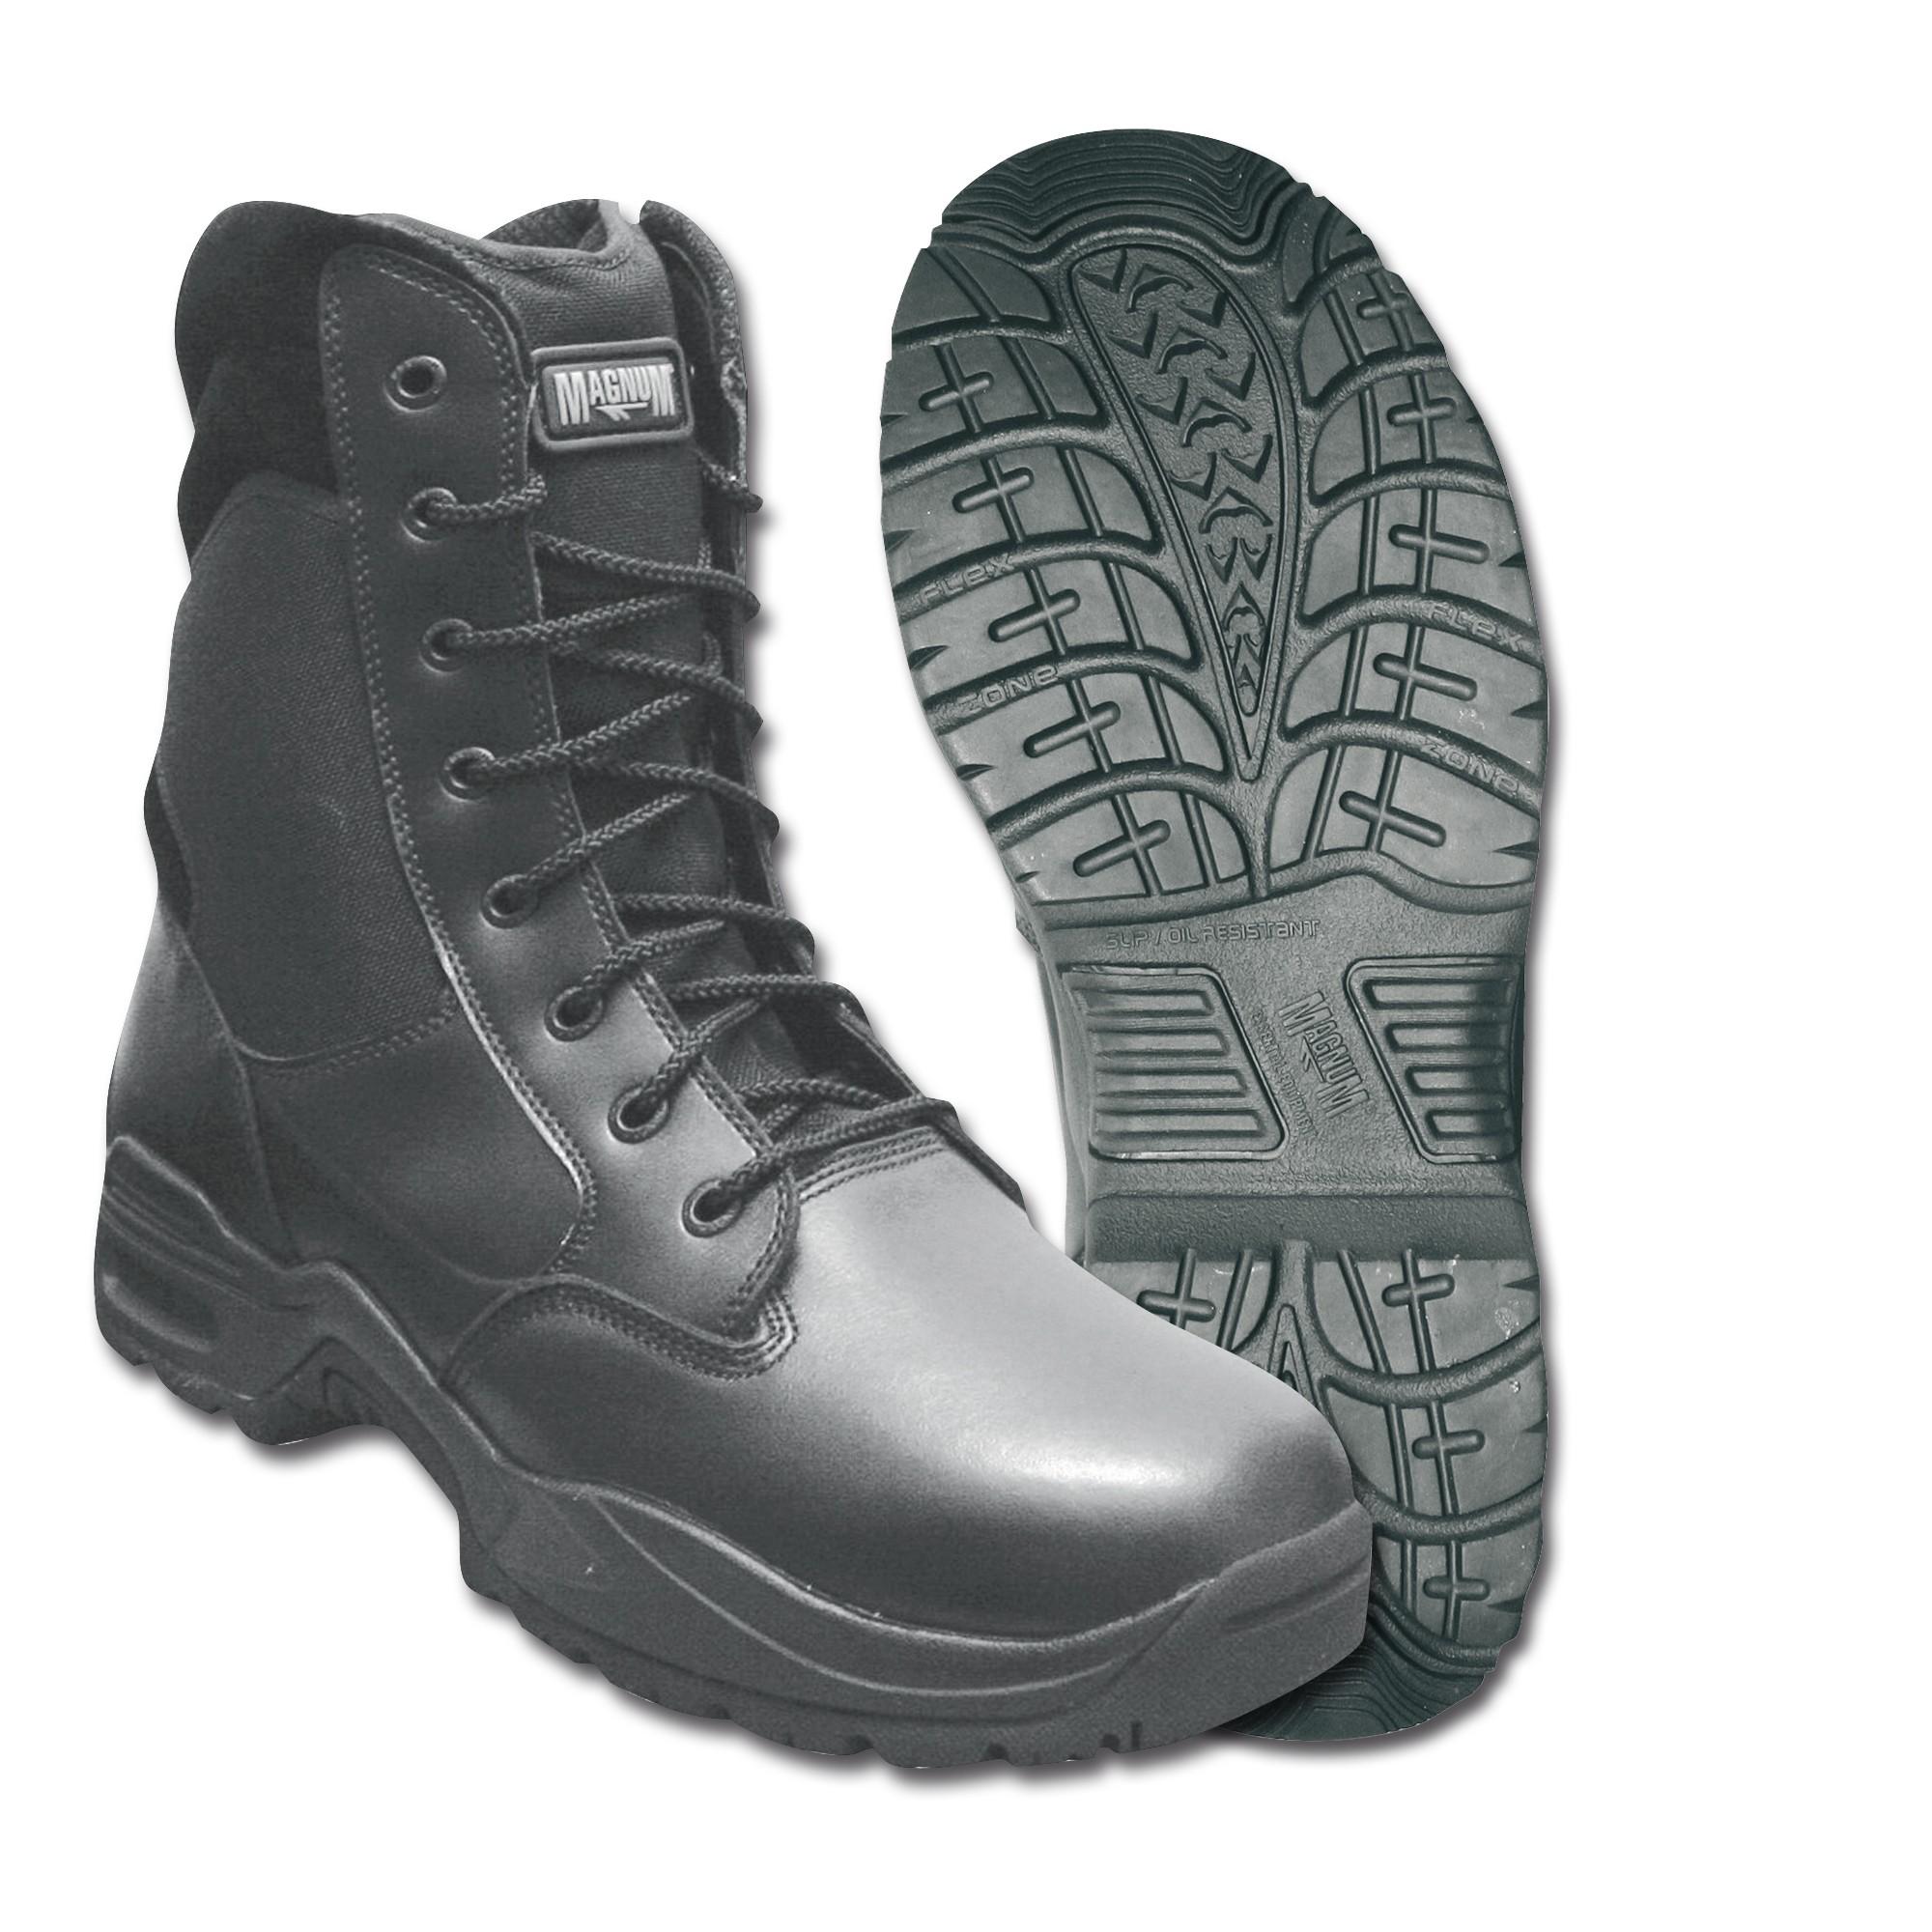 Boots Magnum Hi-Tec Stealth II Side Zip